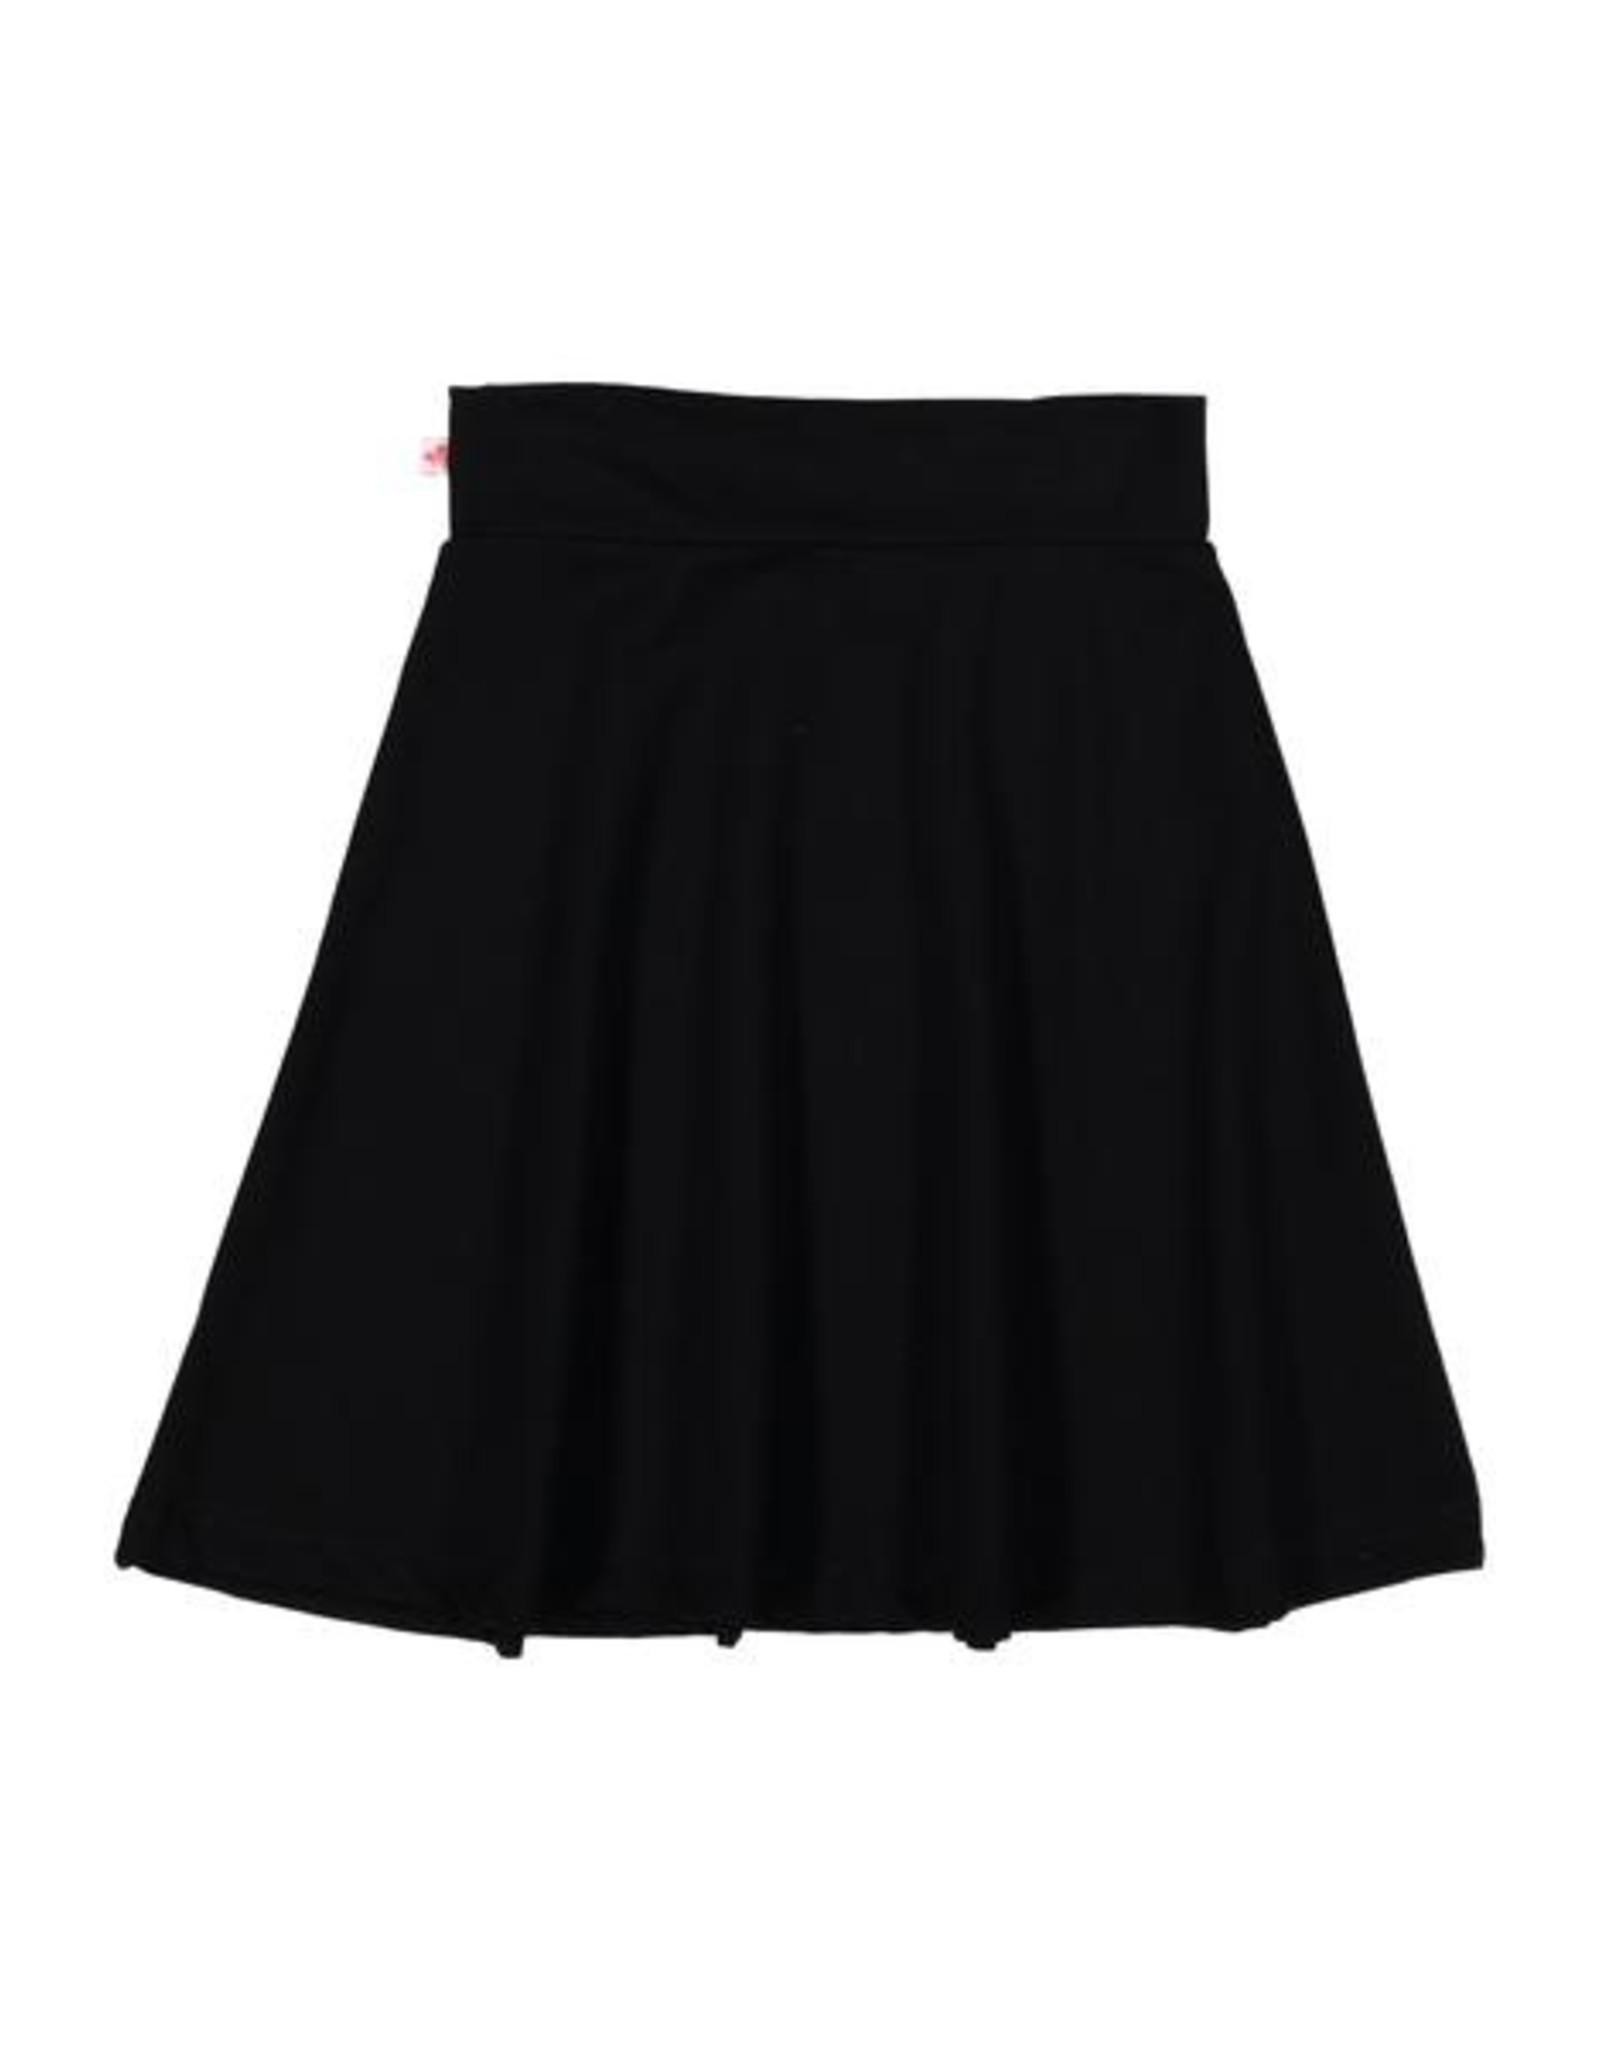 Three Bows Three Bows Classic Aline Skirt